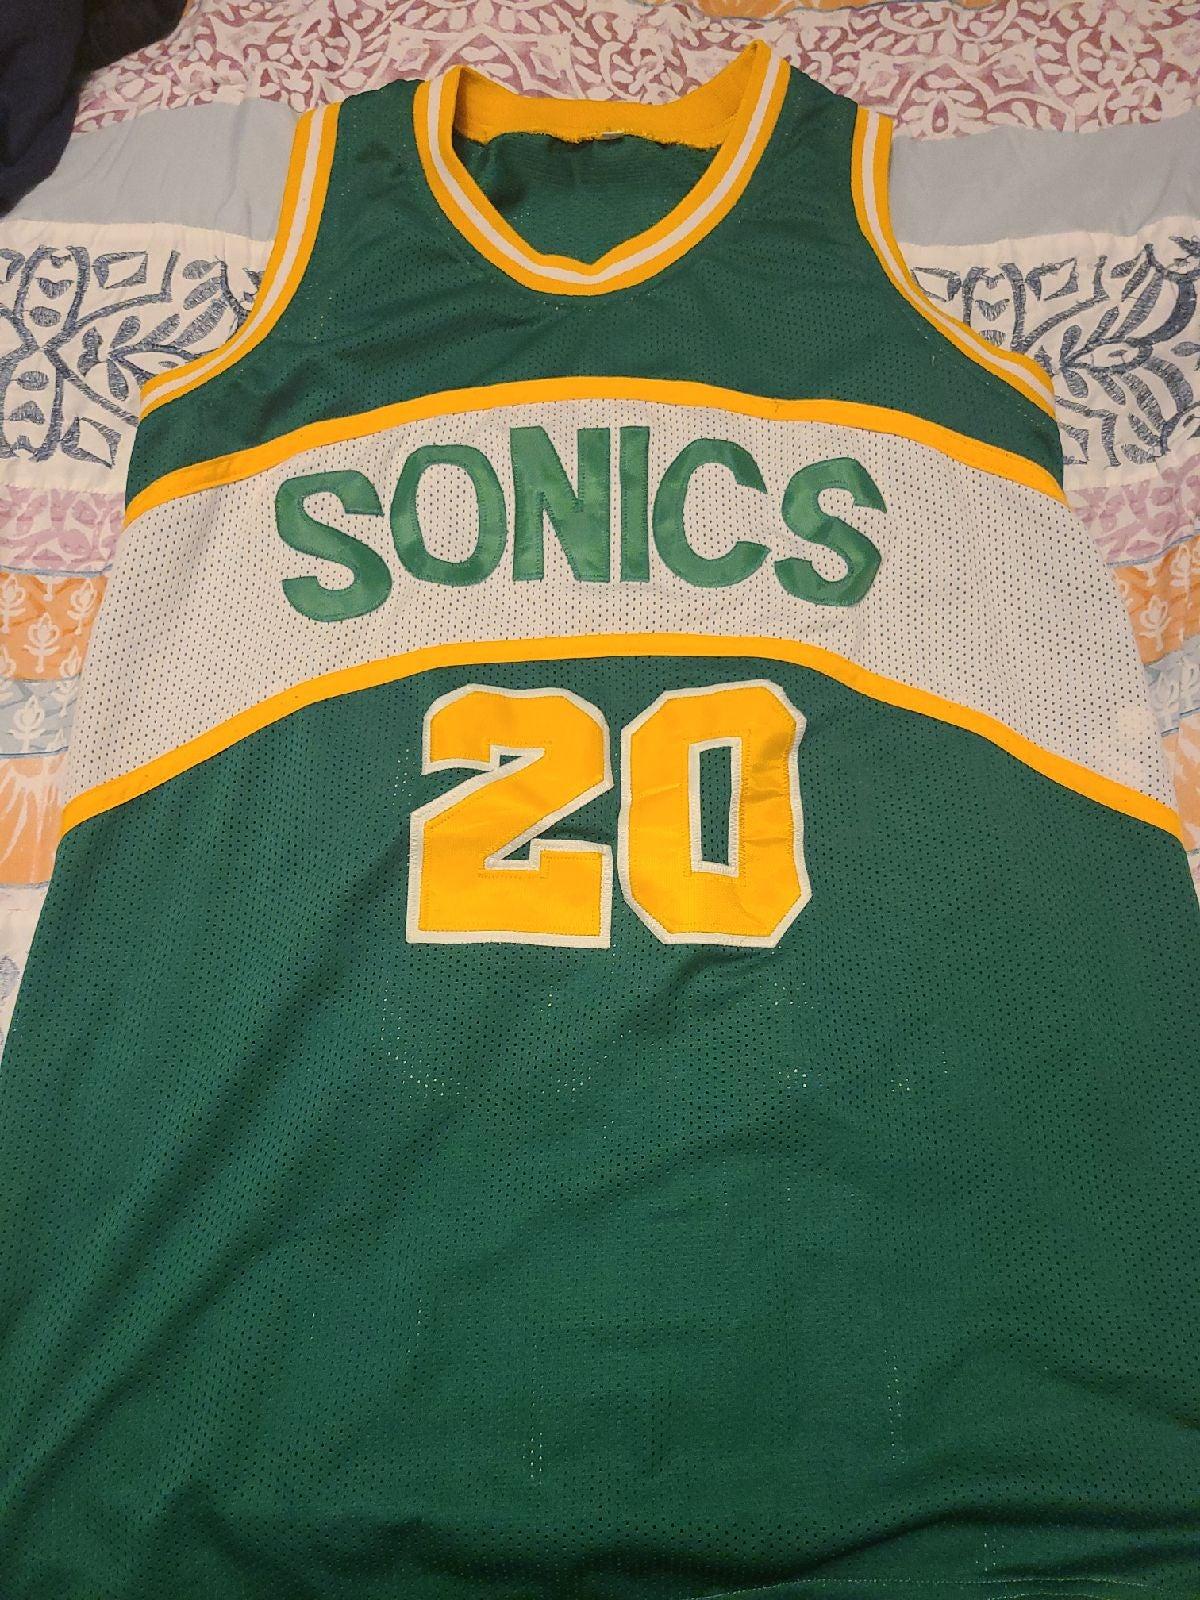 Sonics jersey